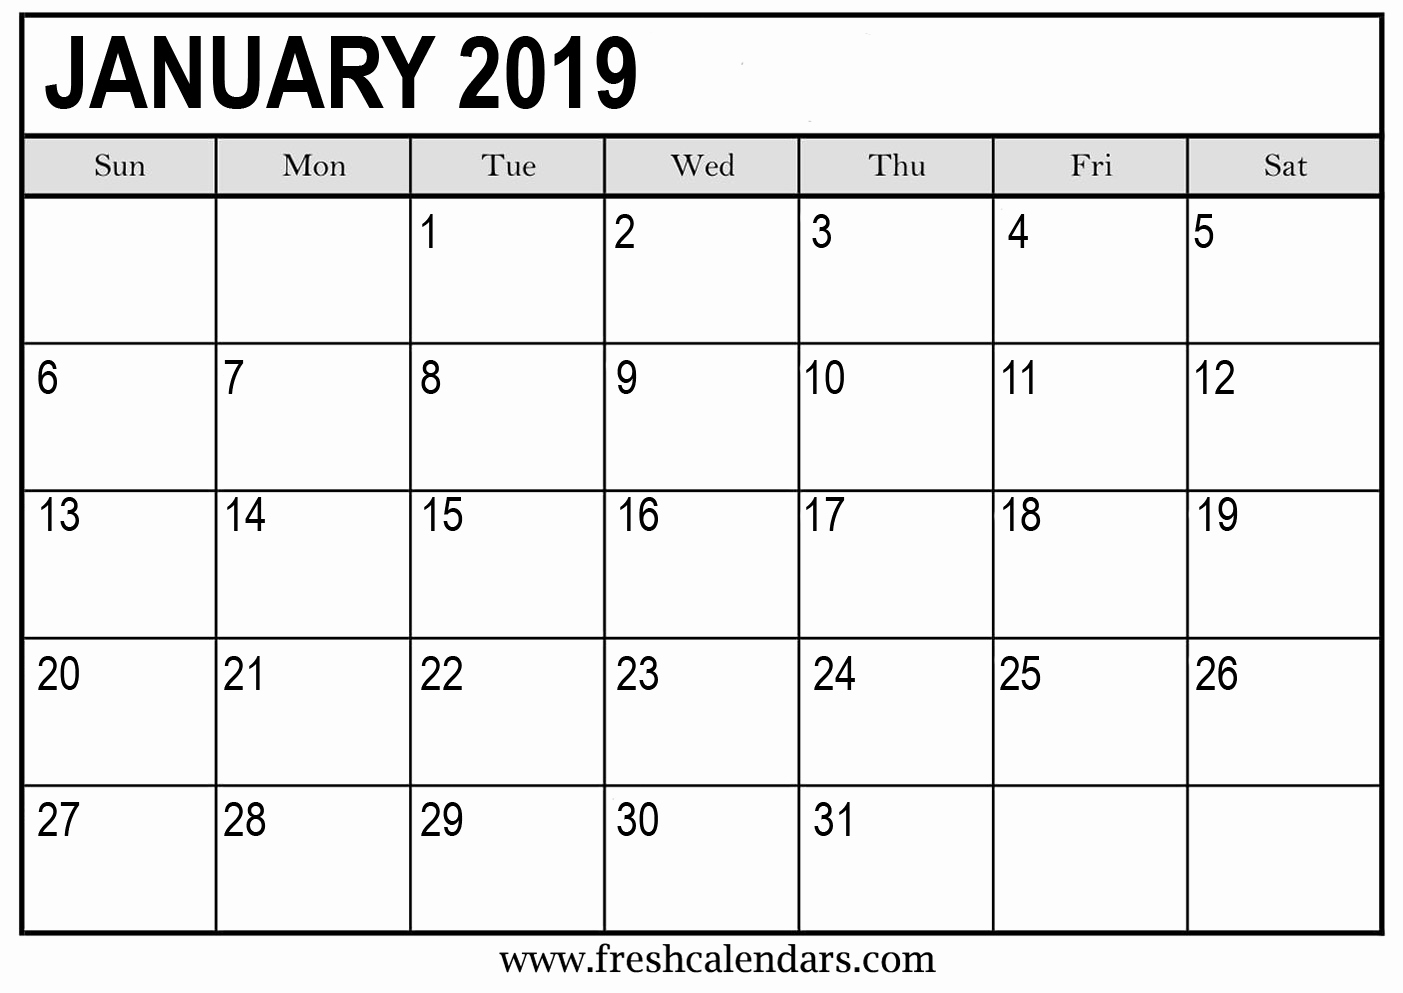 2019 Monthly Calendar Template Awesome January 2019 Calendar Printable Fresh Calendars